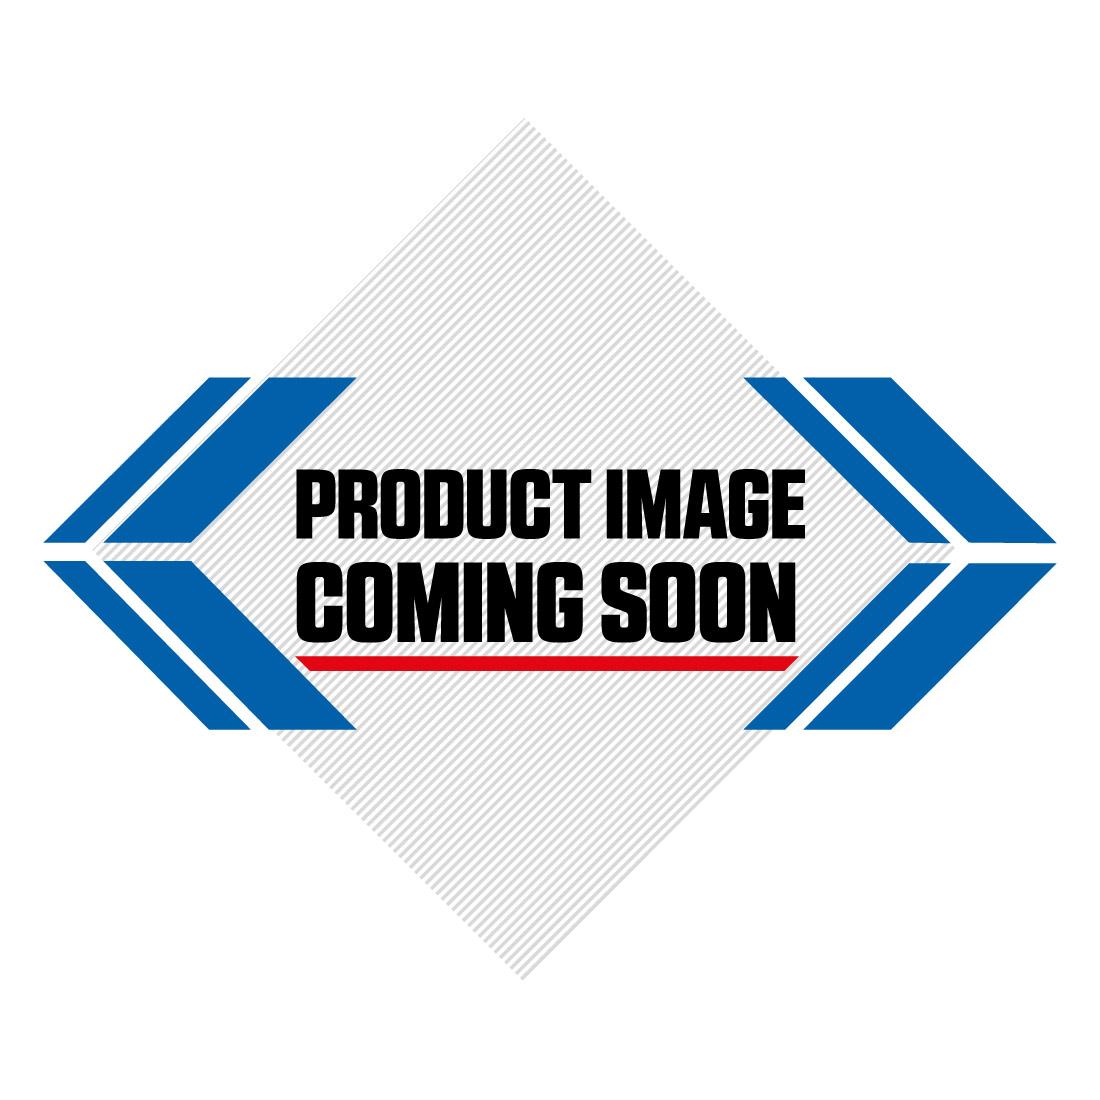 100% Armega Forecast Dual Pane Replacement Goggle Lens Image-1